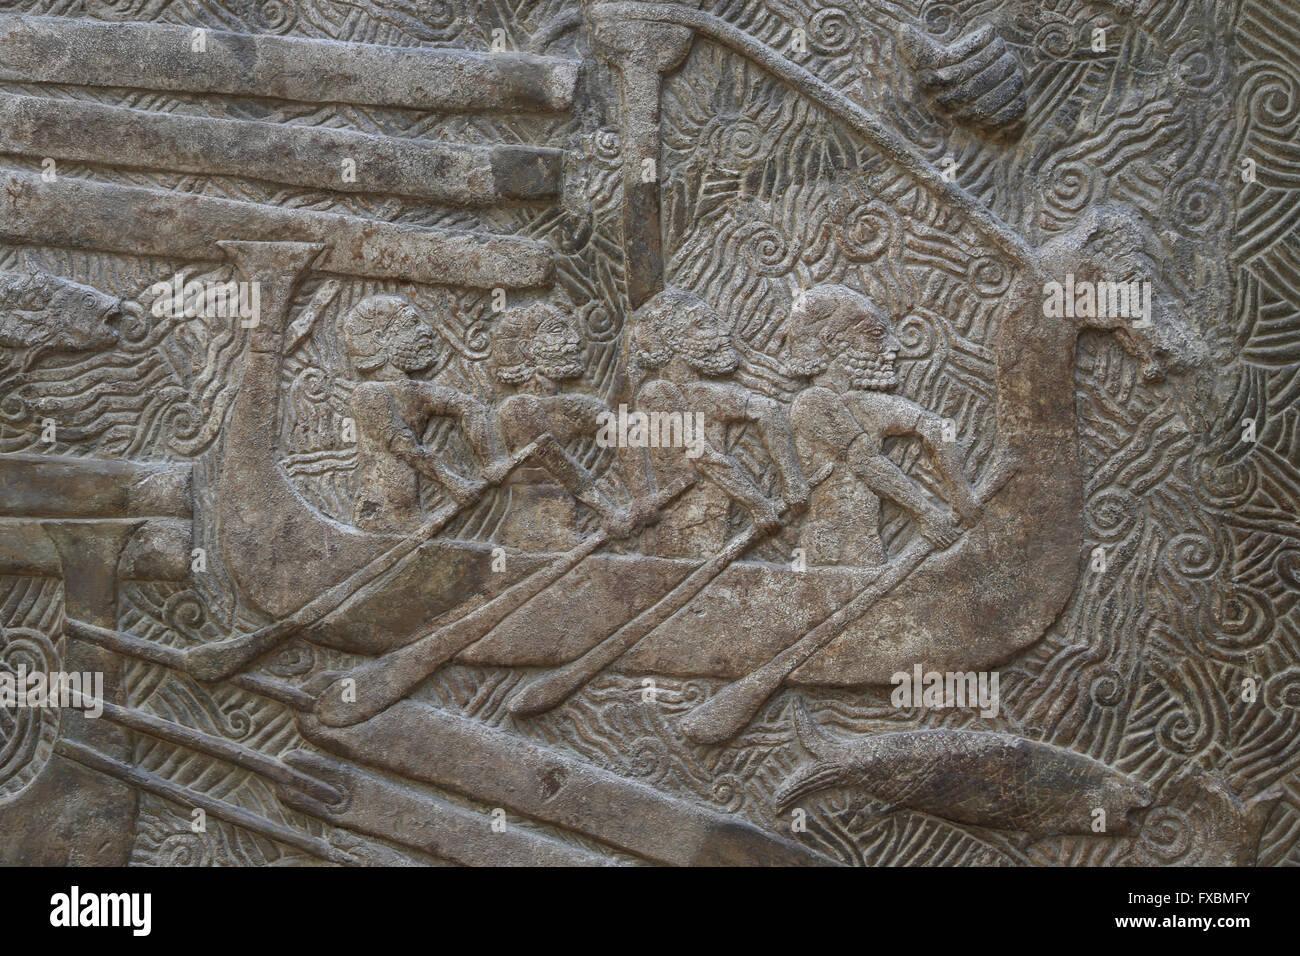 Slab. Transportation of timber (cedars of Lebanon, Phoenician civilization). Transport ships. Palace of Sargon II, - Stock Image